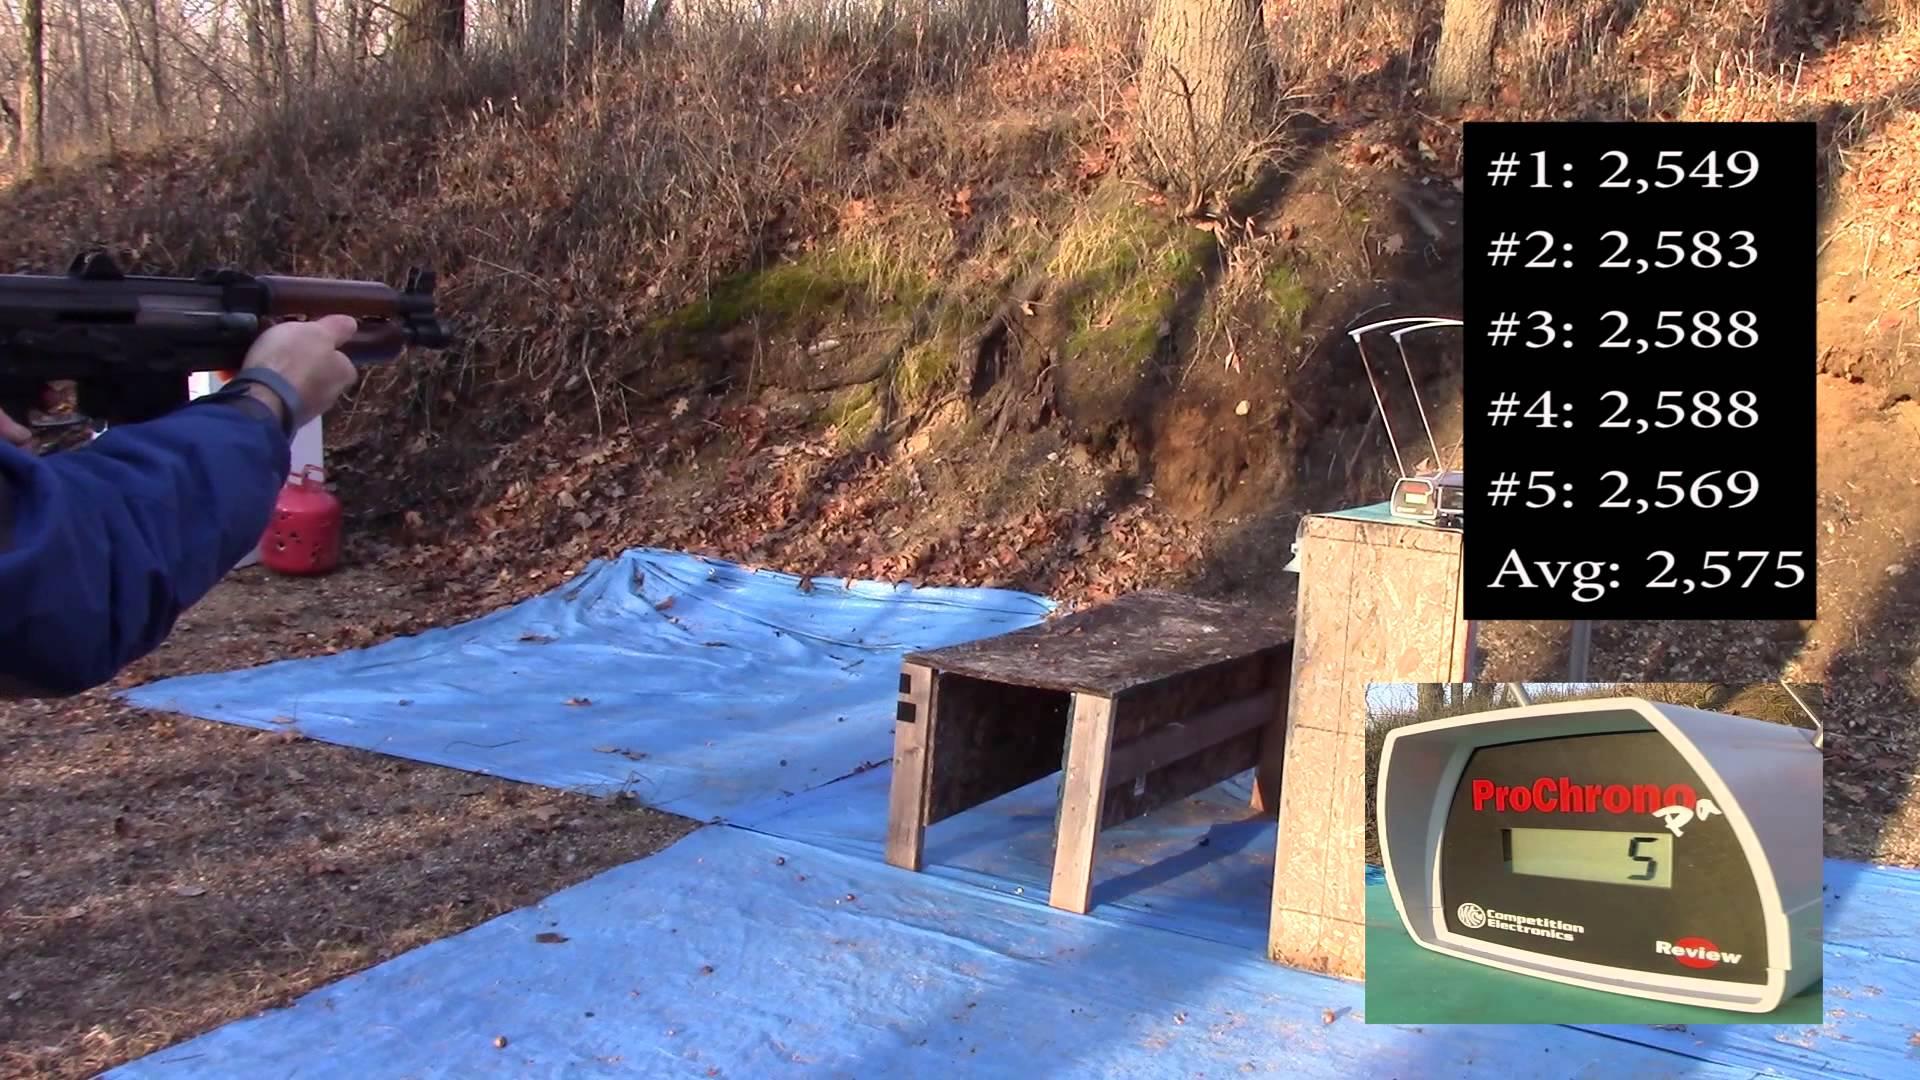 5.56x45mm, 55gr FMJ, Lake City Surplus (XM193), Velocity Tests